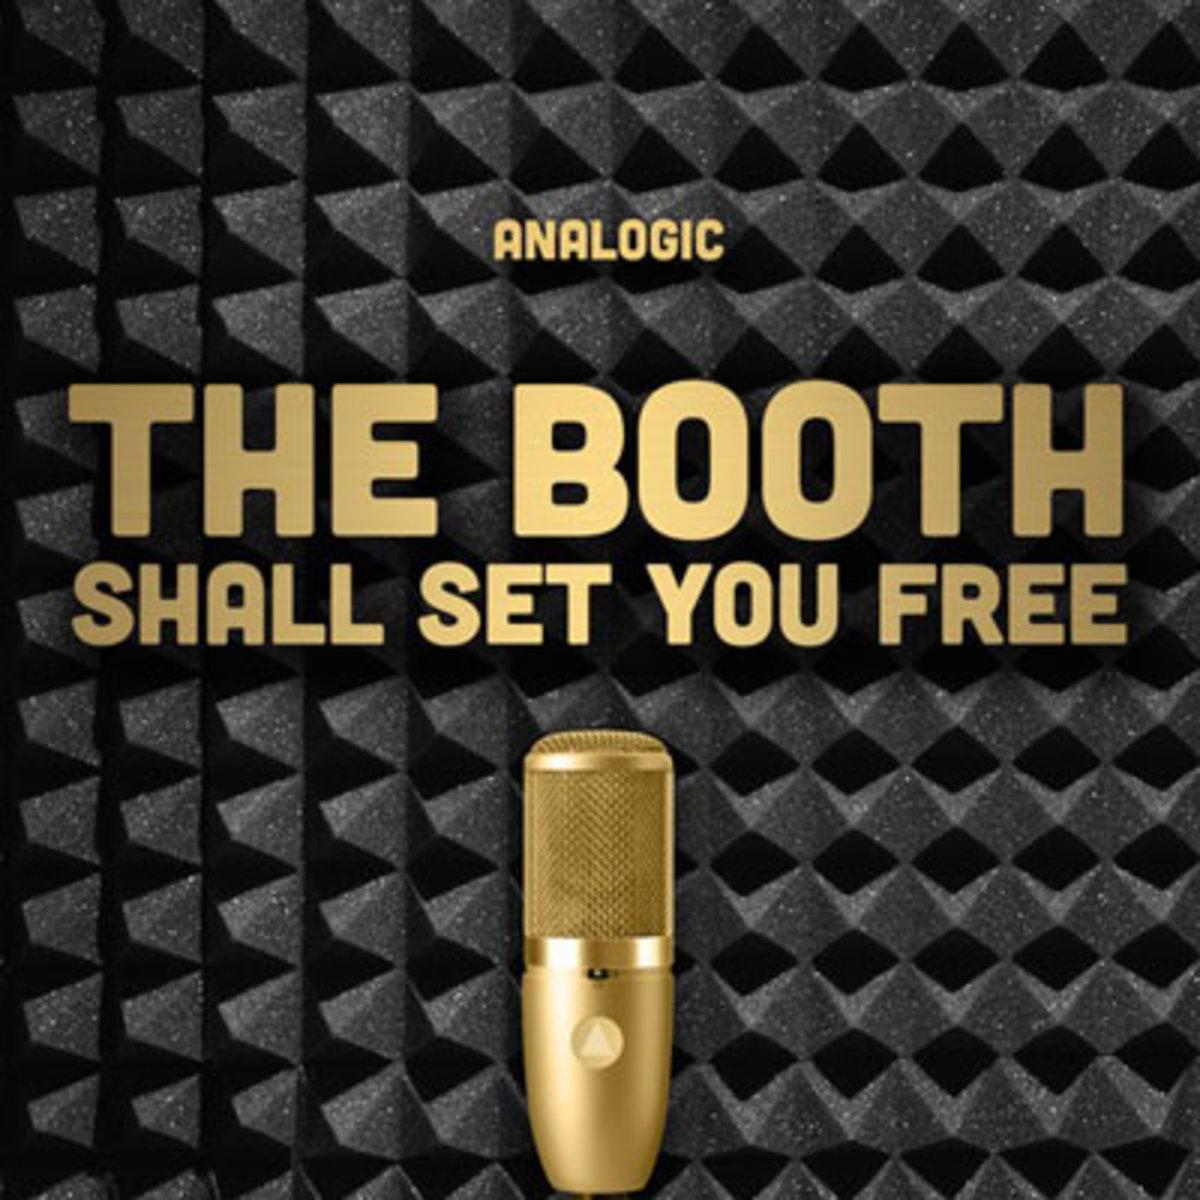 analogic-theboothshall.jpg